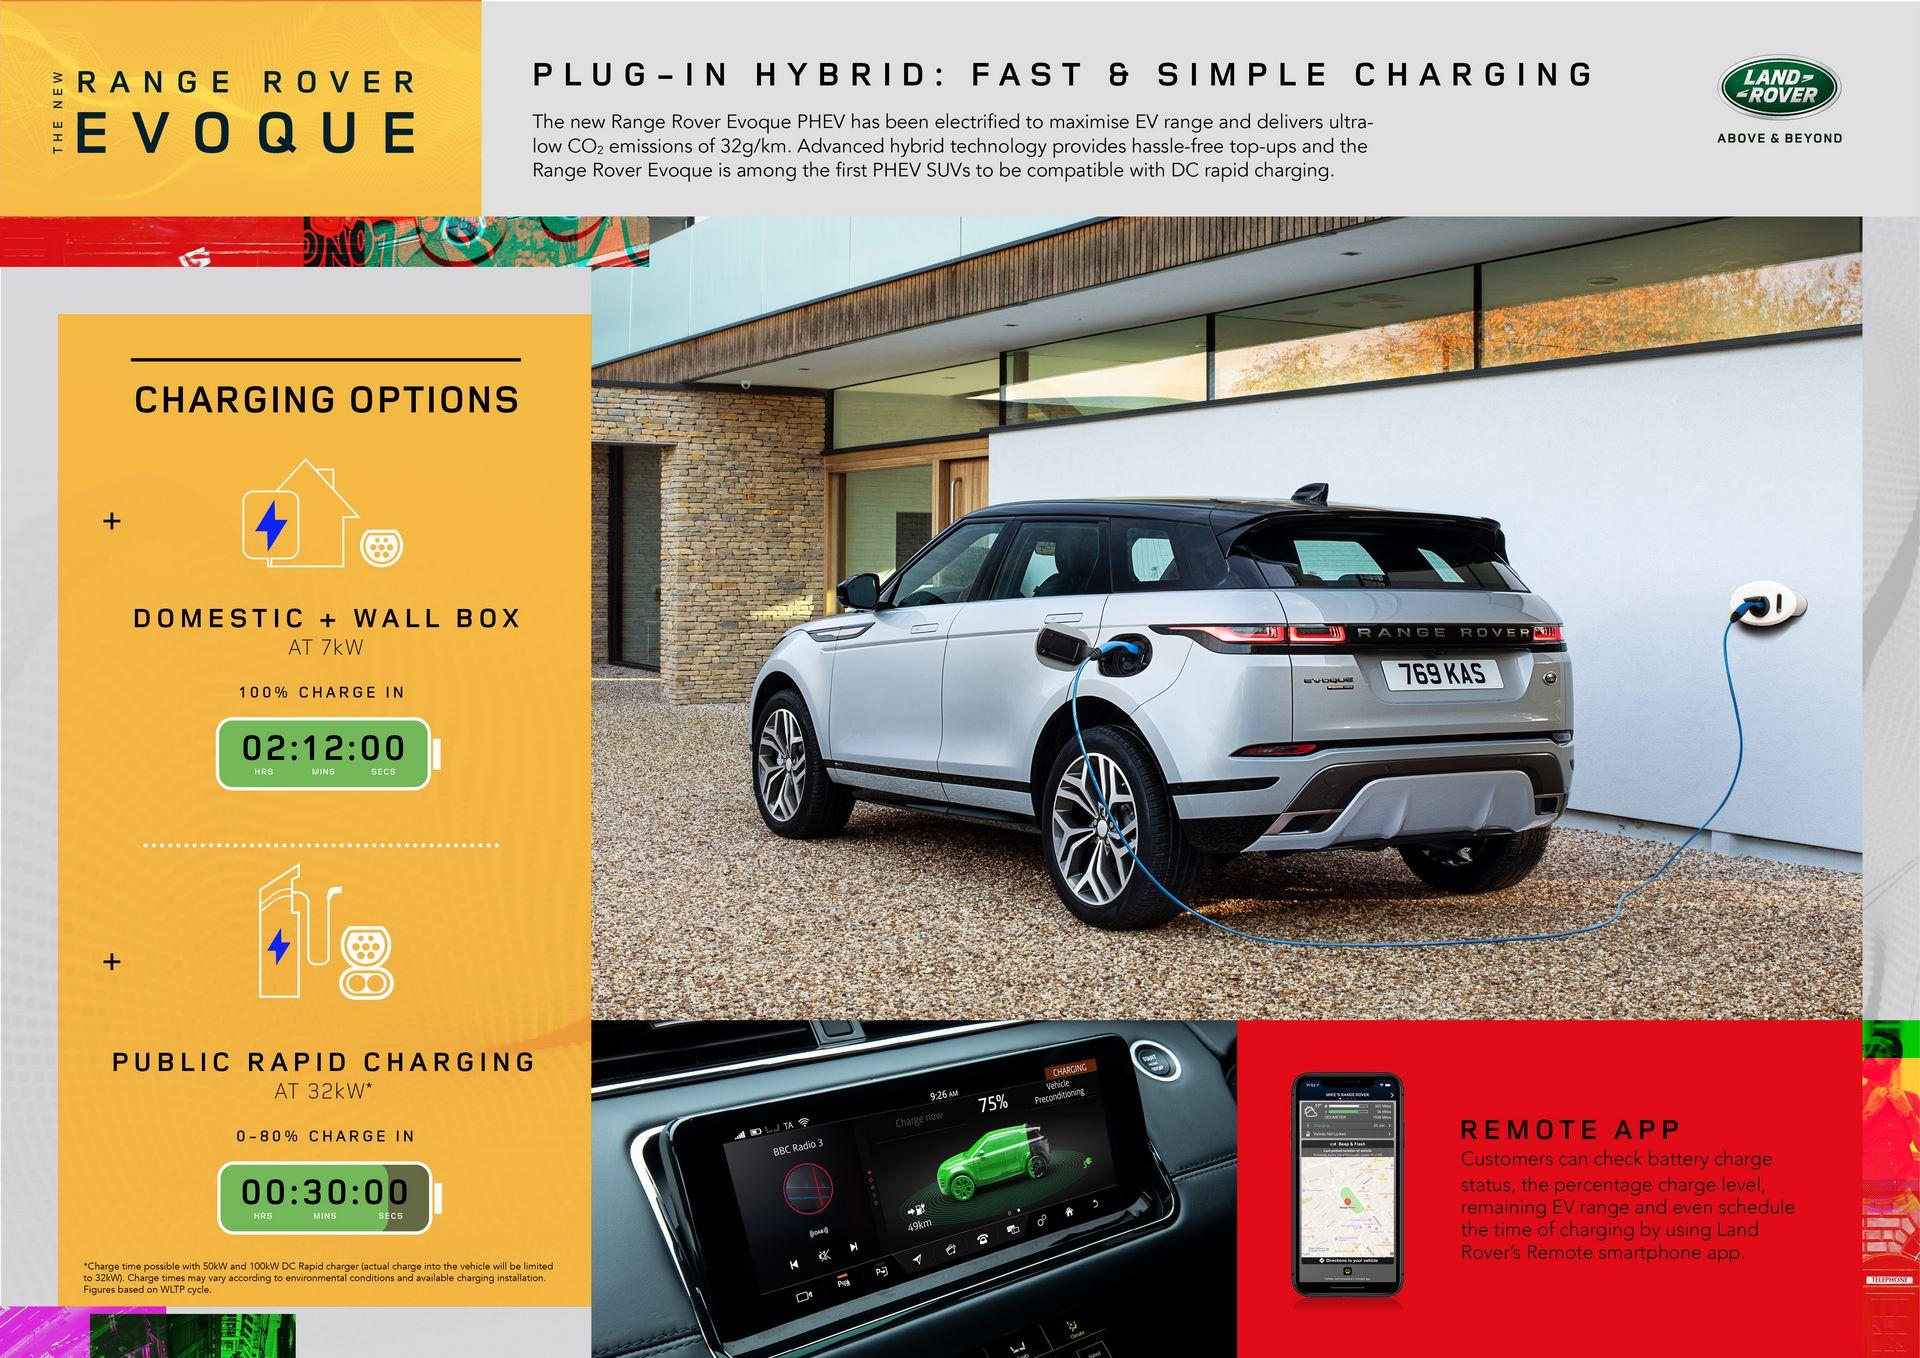 Plug-in-hybrid-Rabge-Rover-Evoque-PHEV-21